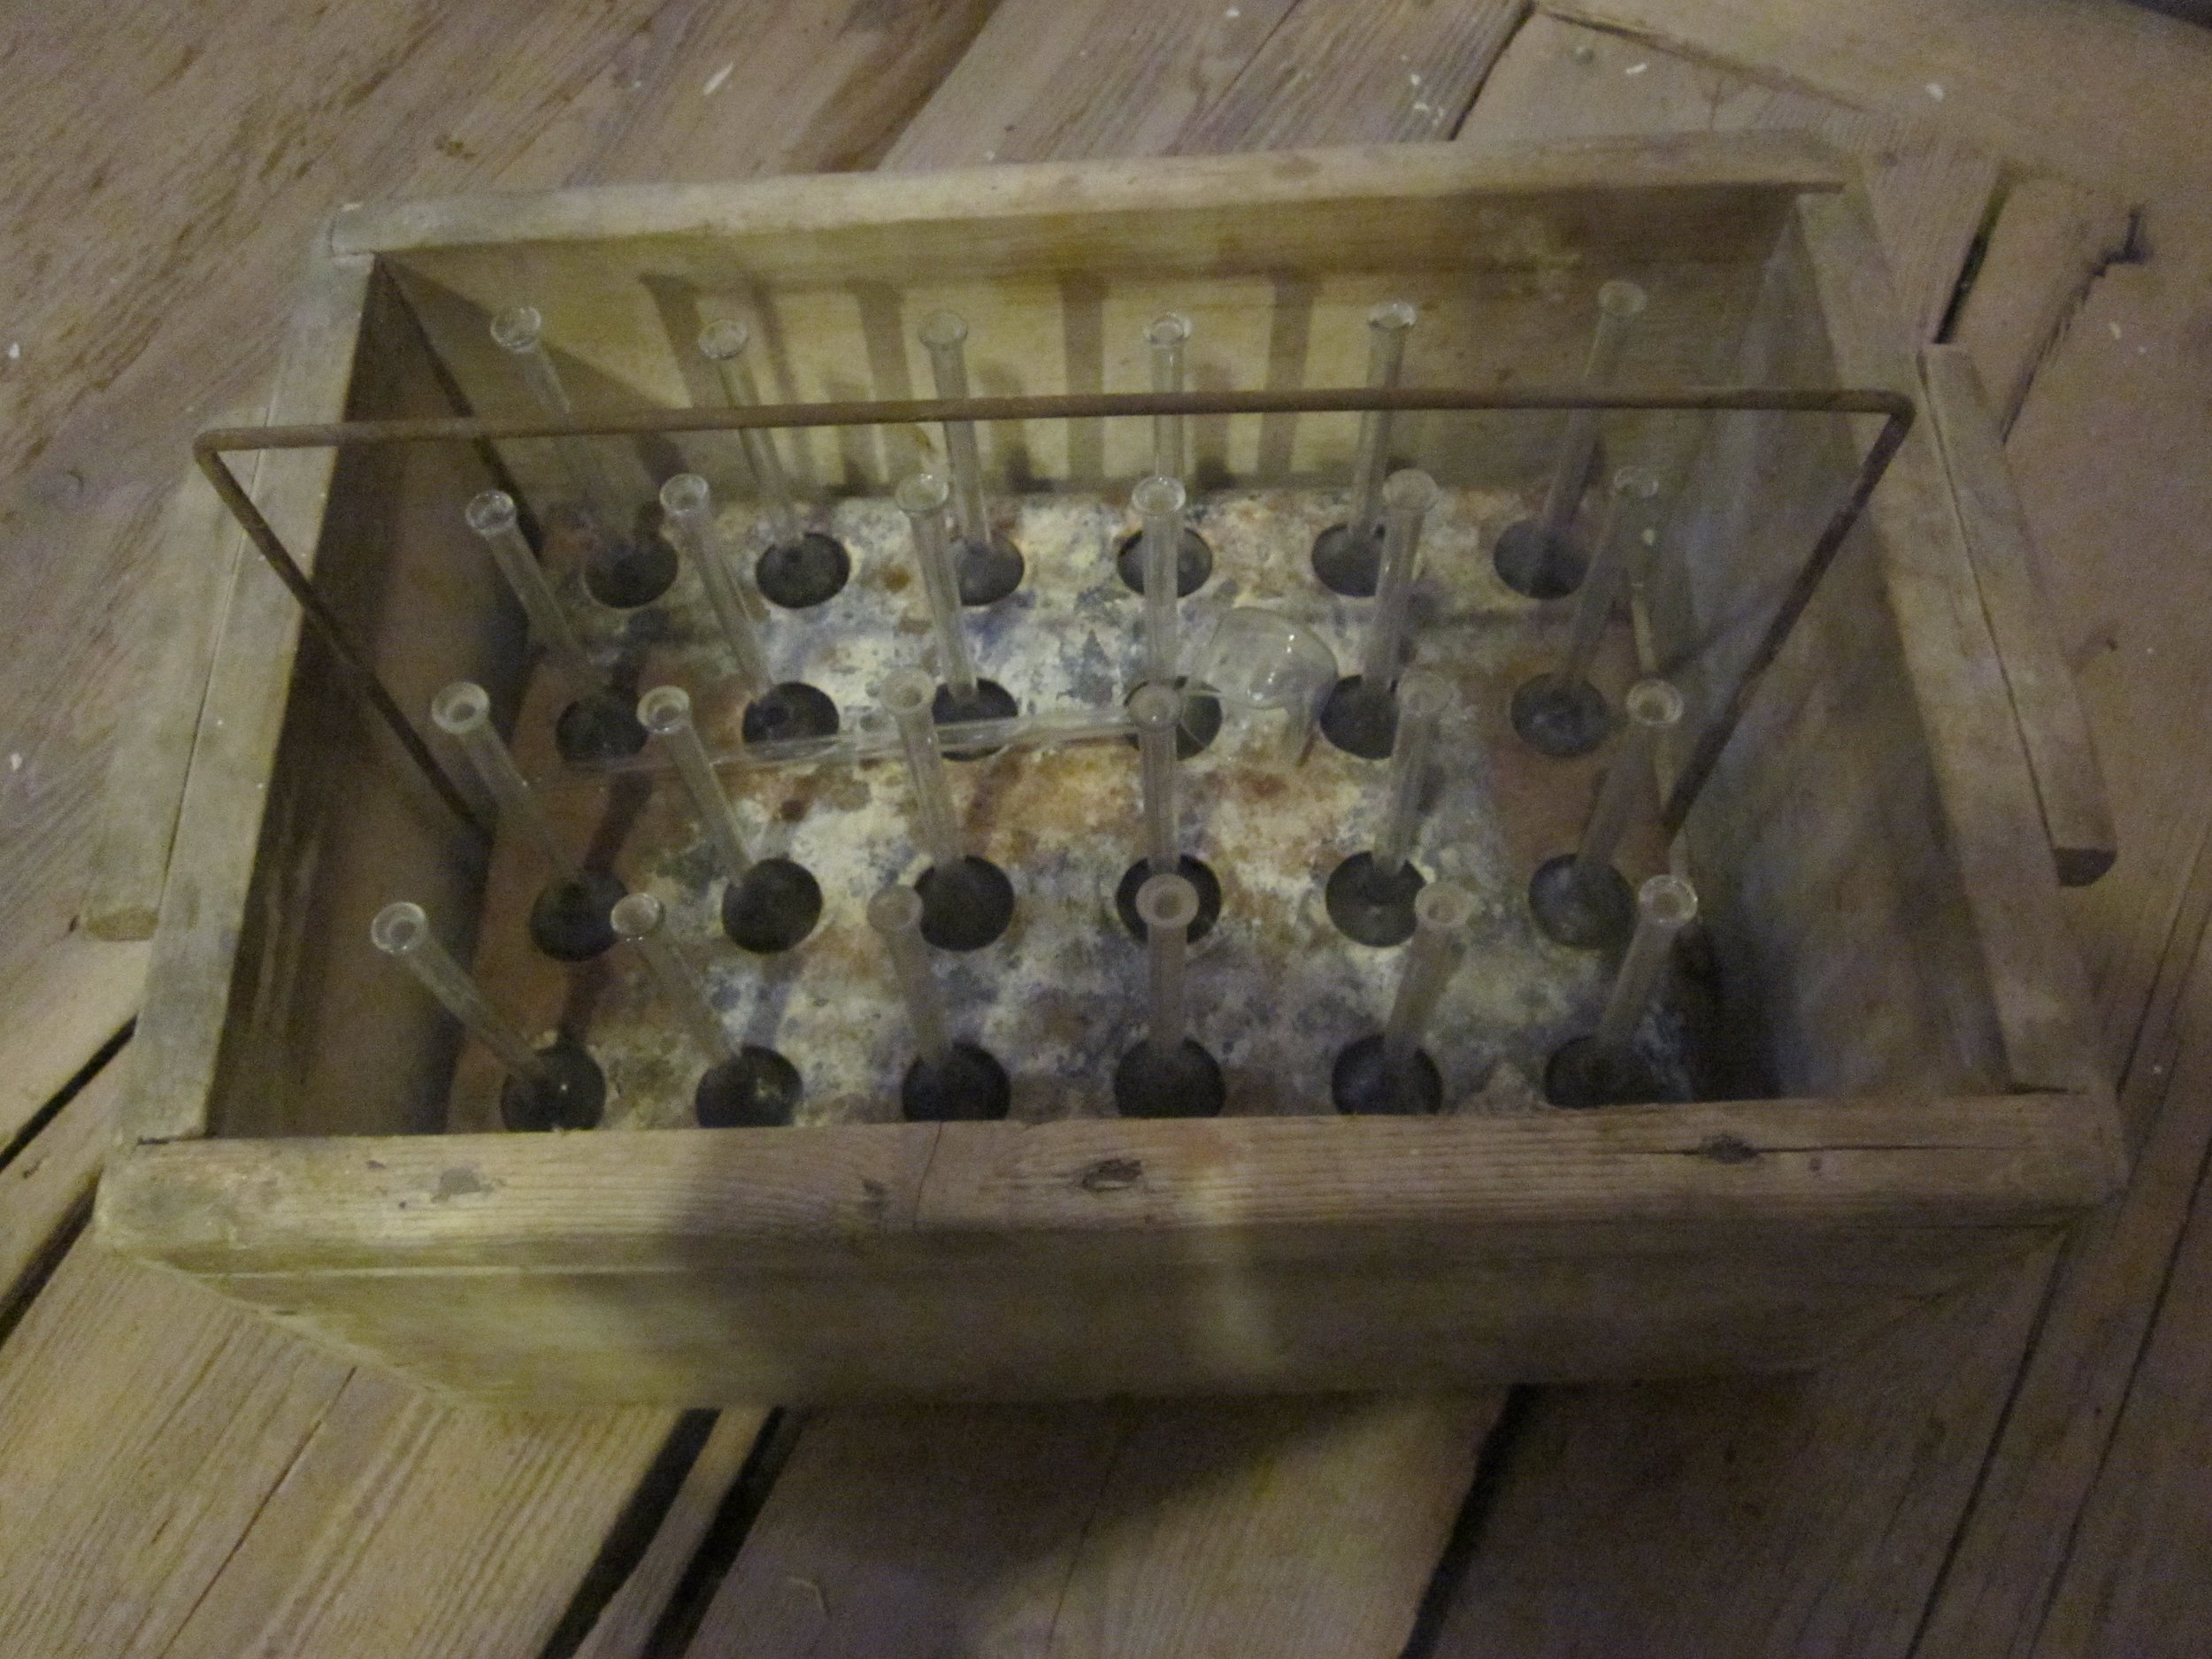 Methylene blue testing kit